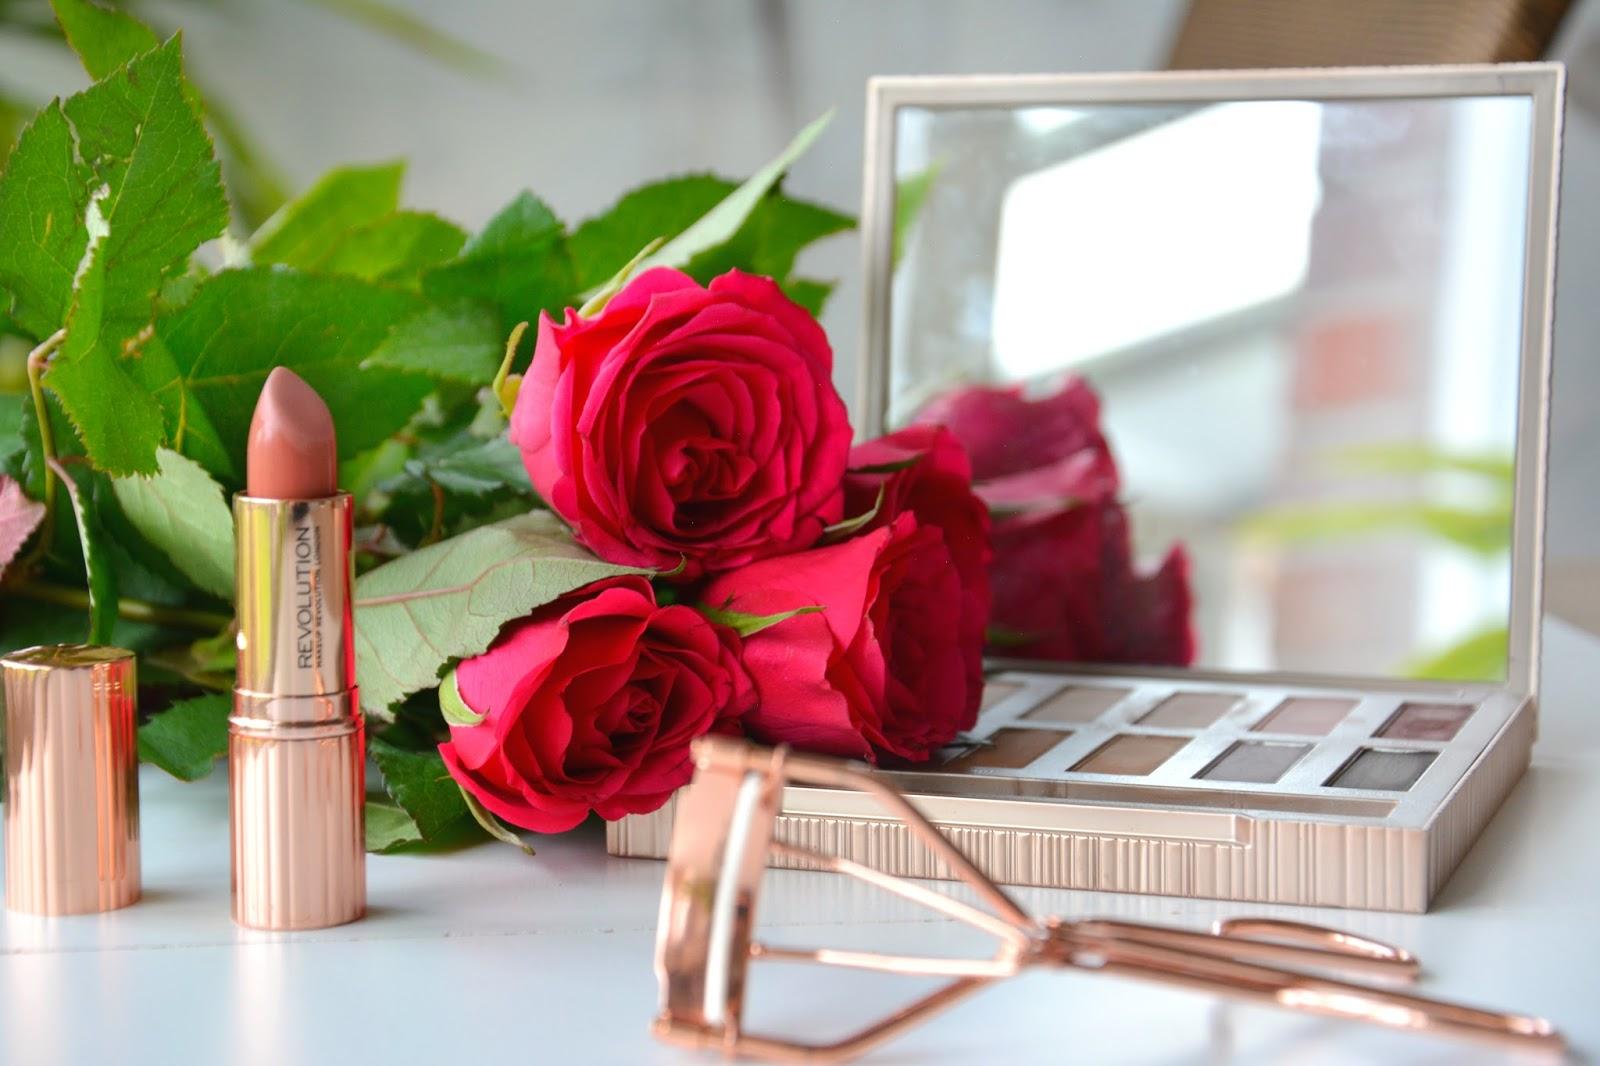 Red Roses; Makeup Revolution Renaissance Lipstick Awaken; Urban Decay Naked Ultimate Basic Palette; Primark Eyelash Curler Rosegold